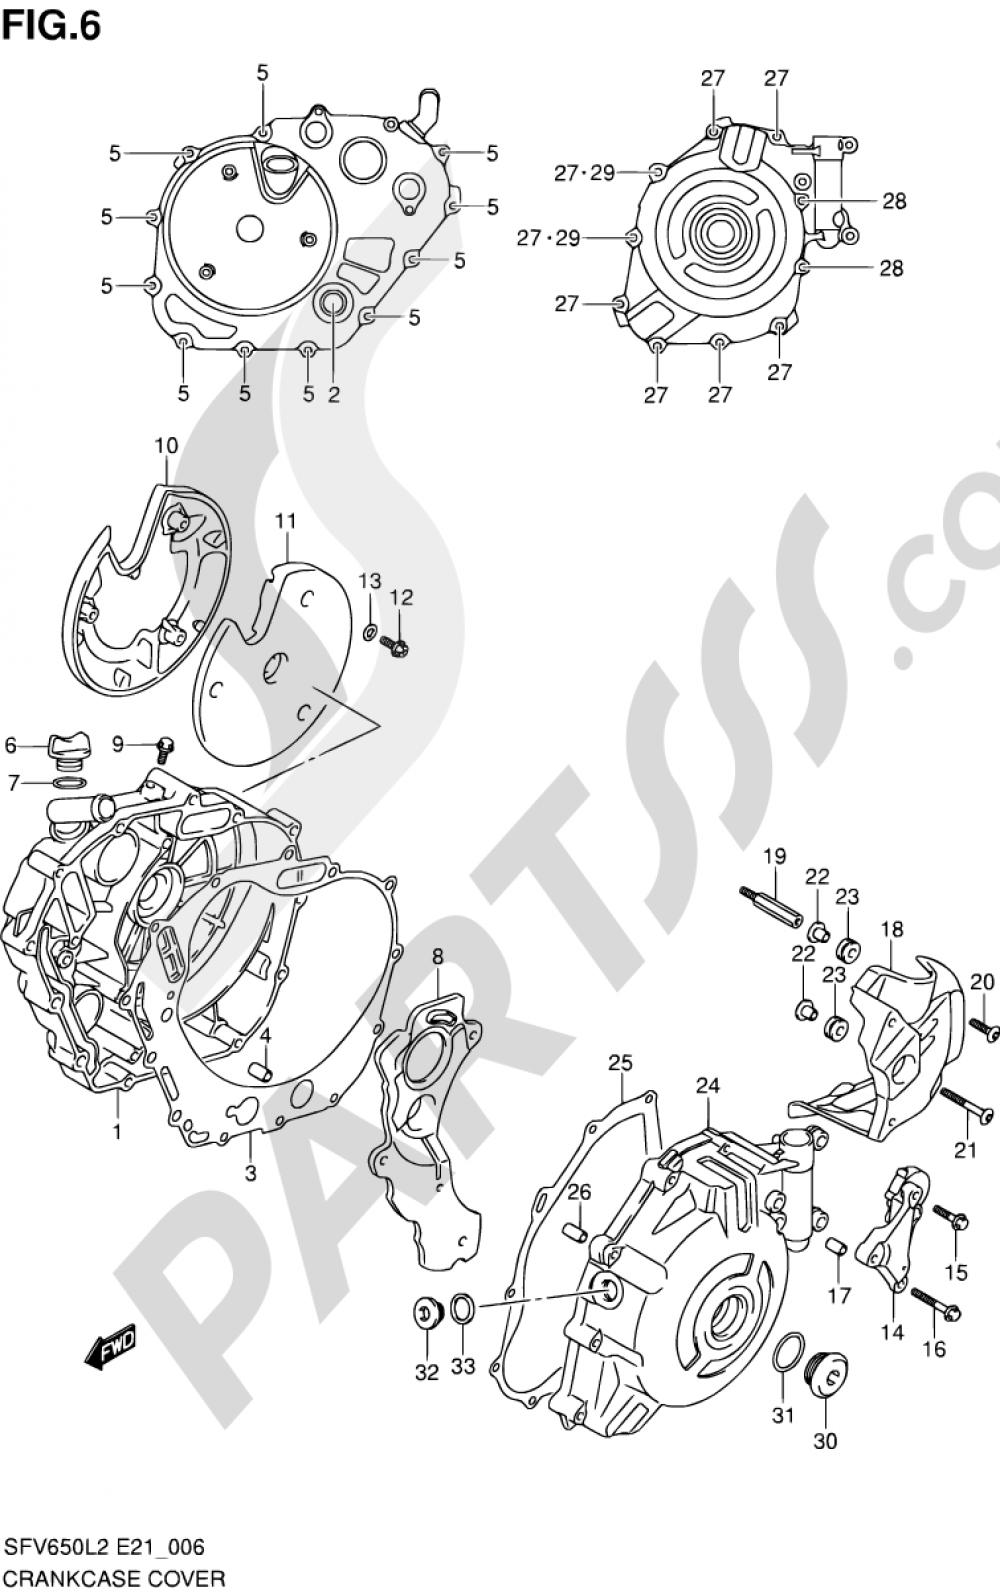 6 - CRANKCASE COVER Suzuki GLADIUS SFV650 2012